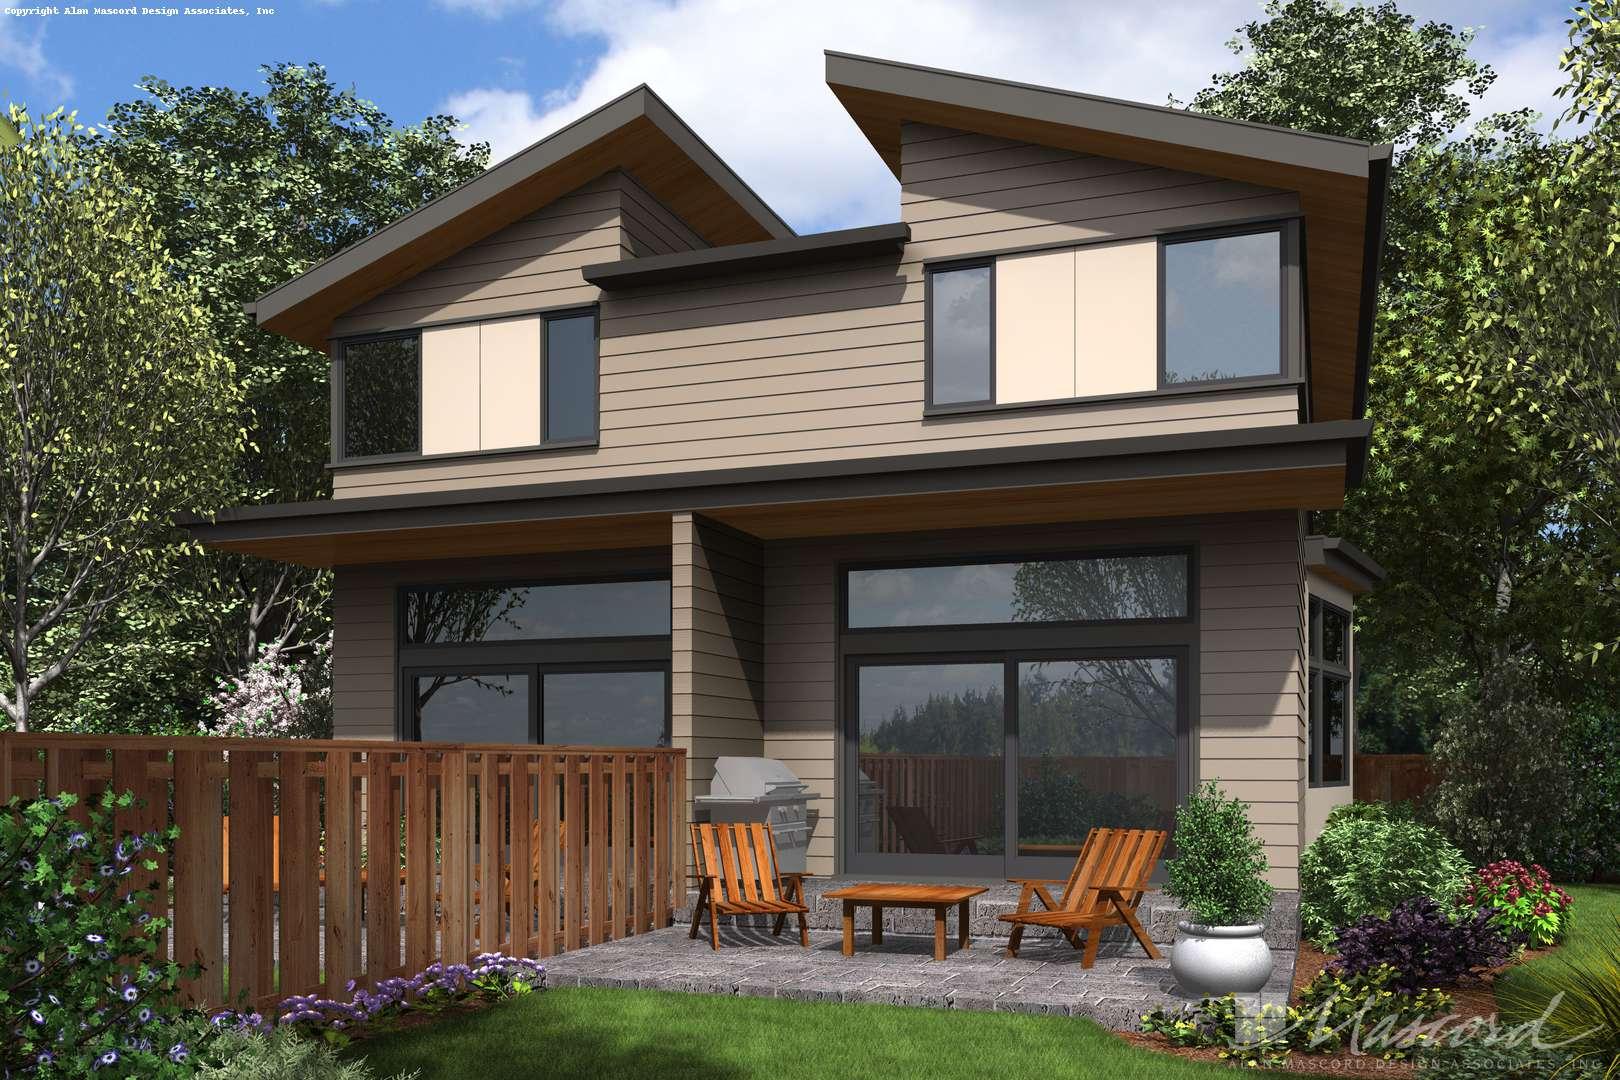 Contemporary House Plan 4044 The Grand Teton: 4002 Sqft, 2 ...